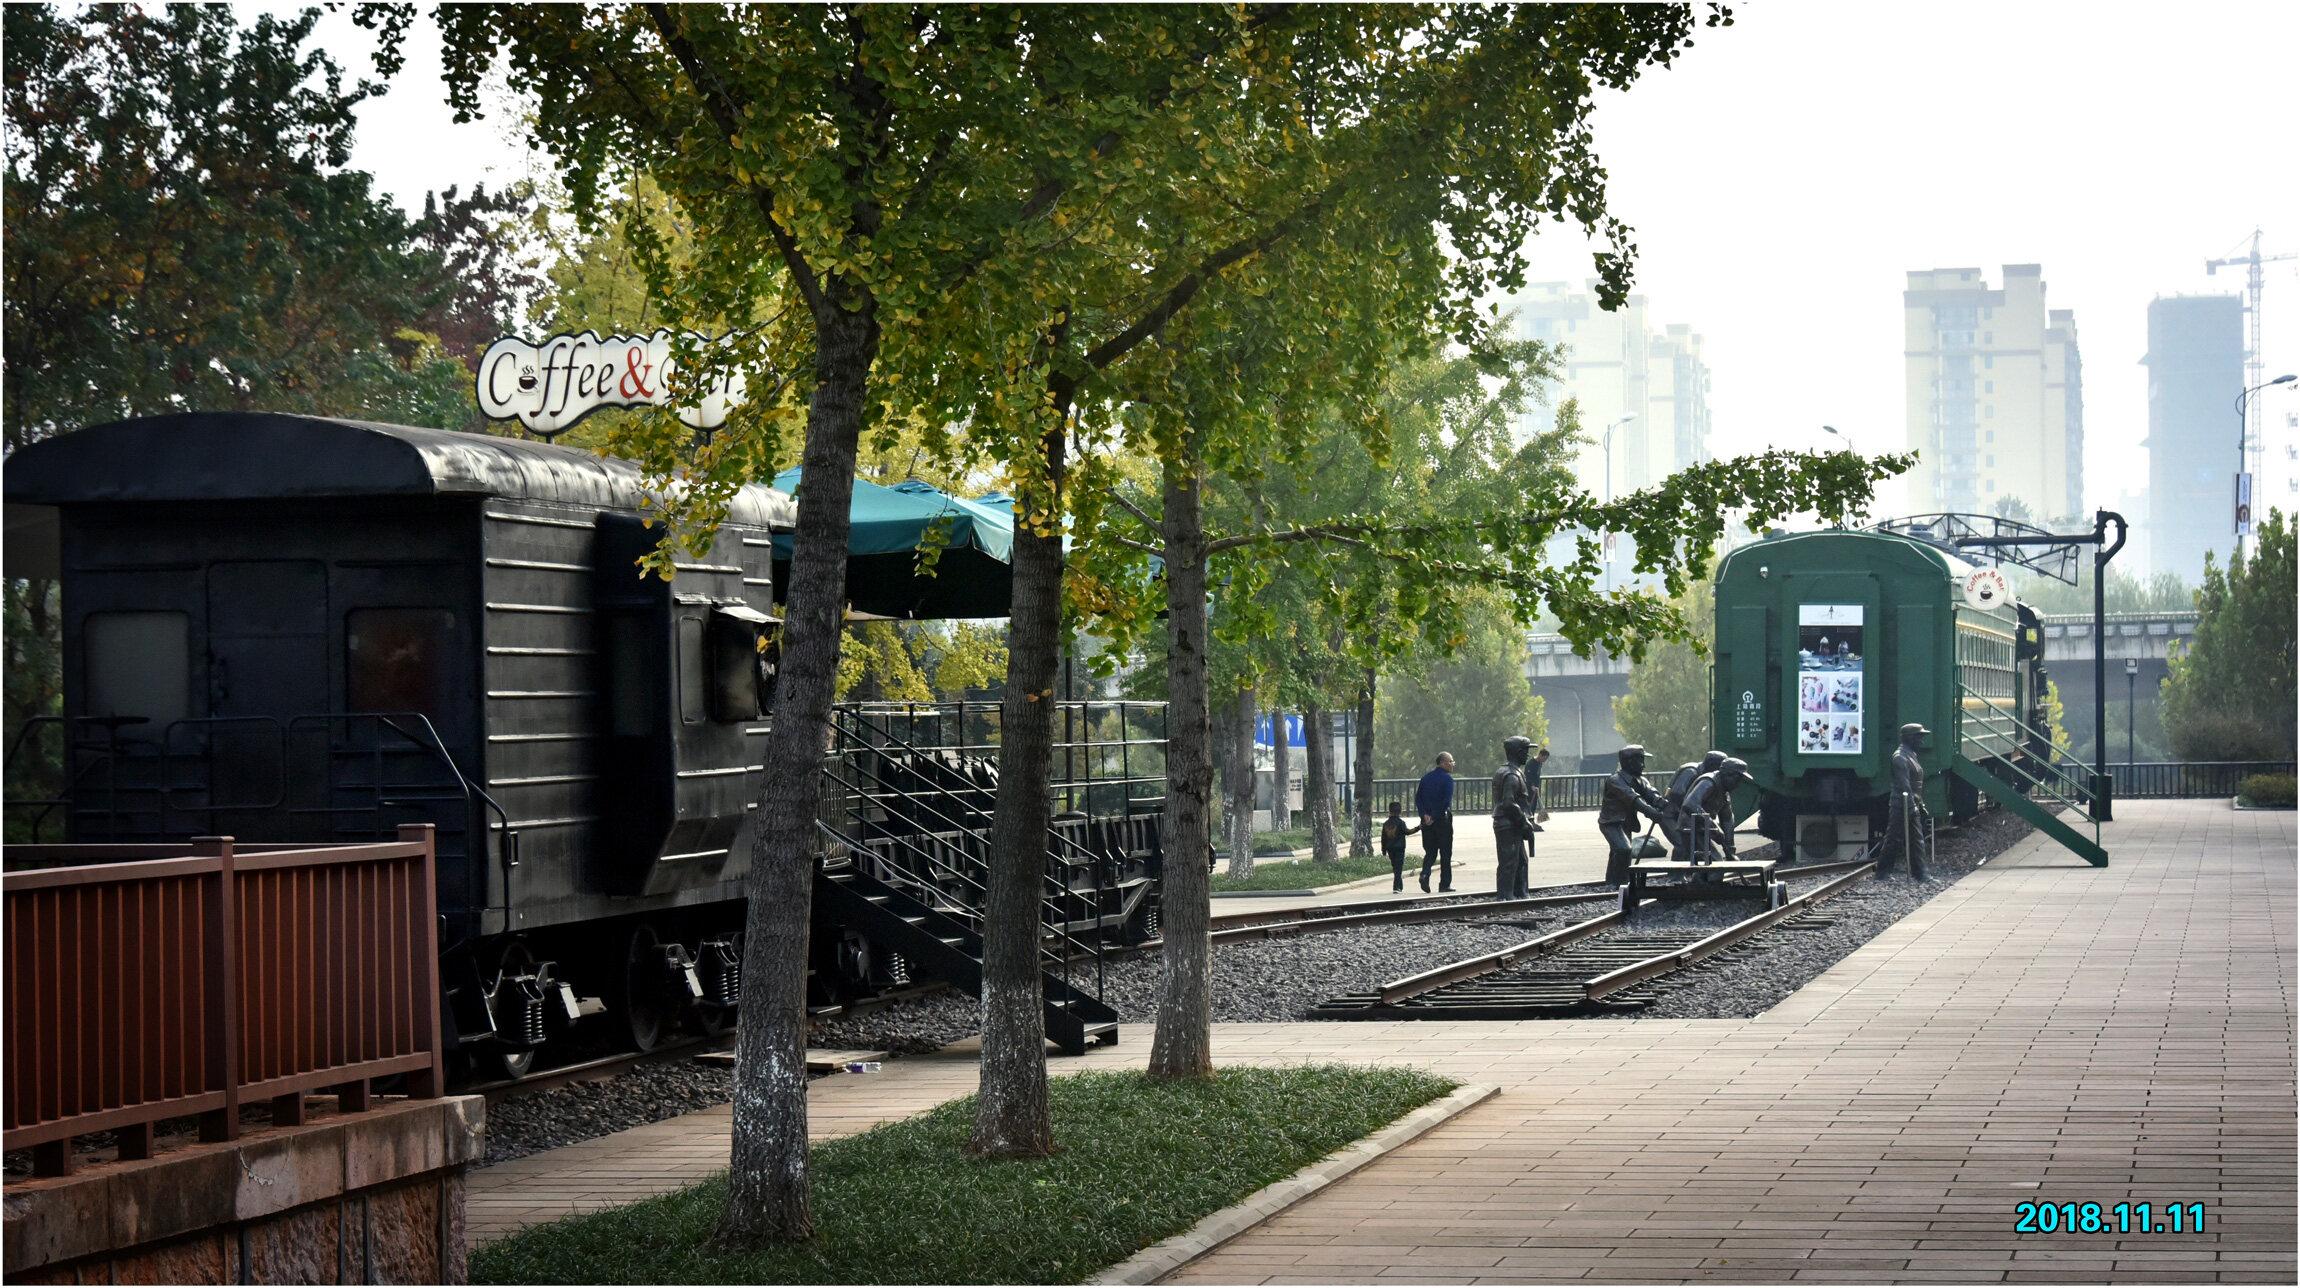 DSC_4249火车头公园 2.jpg